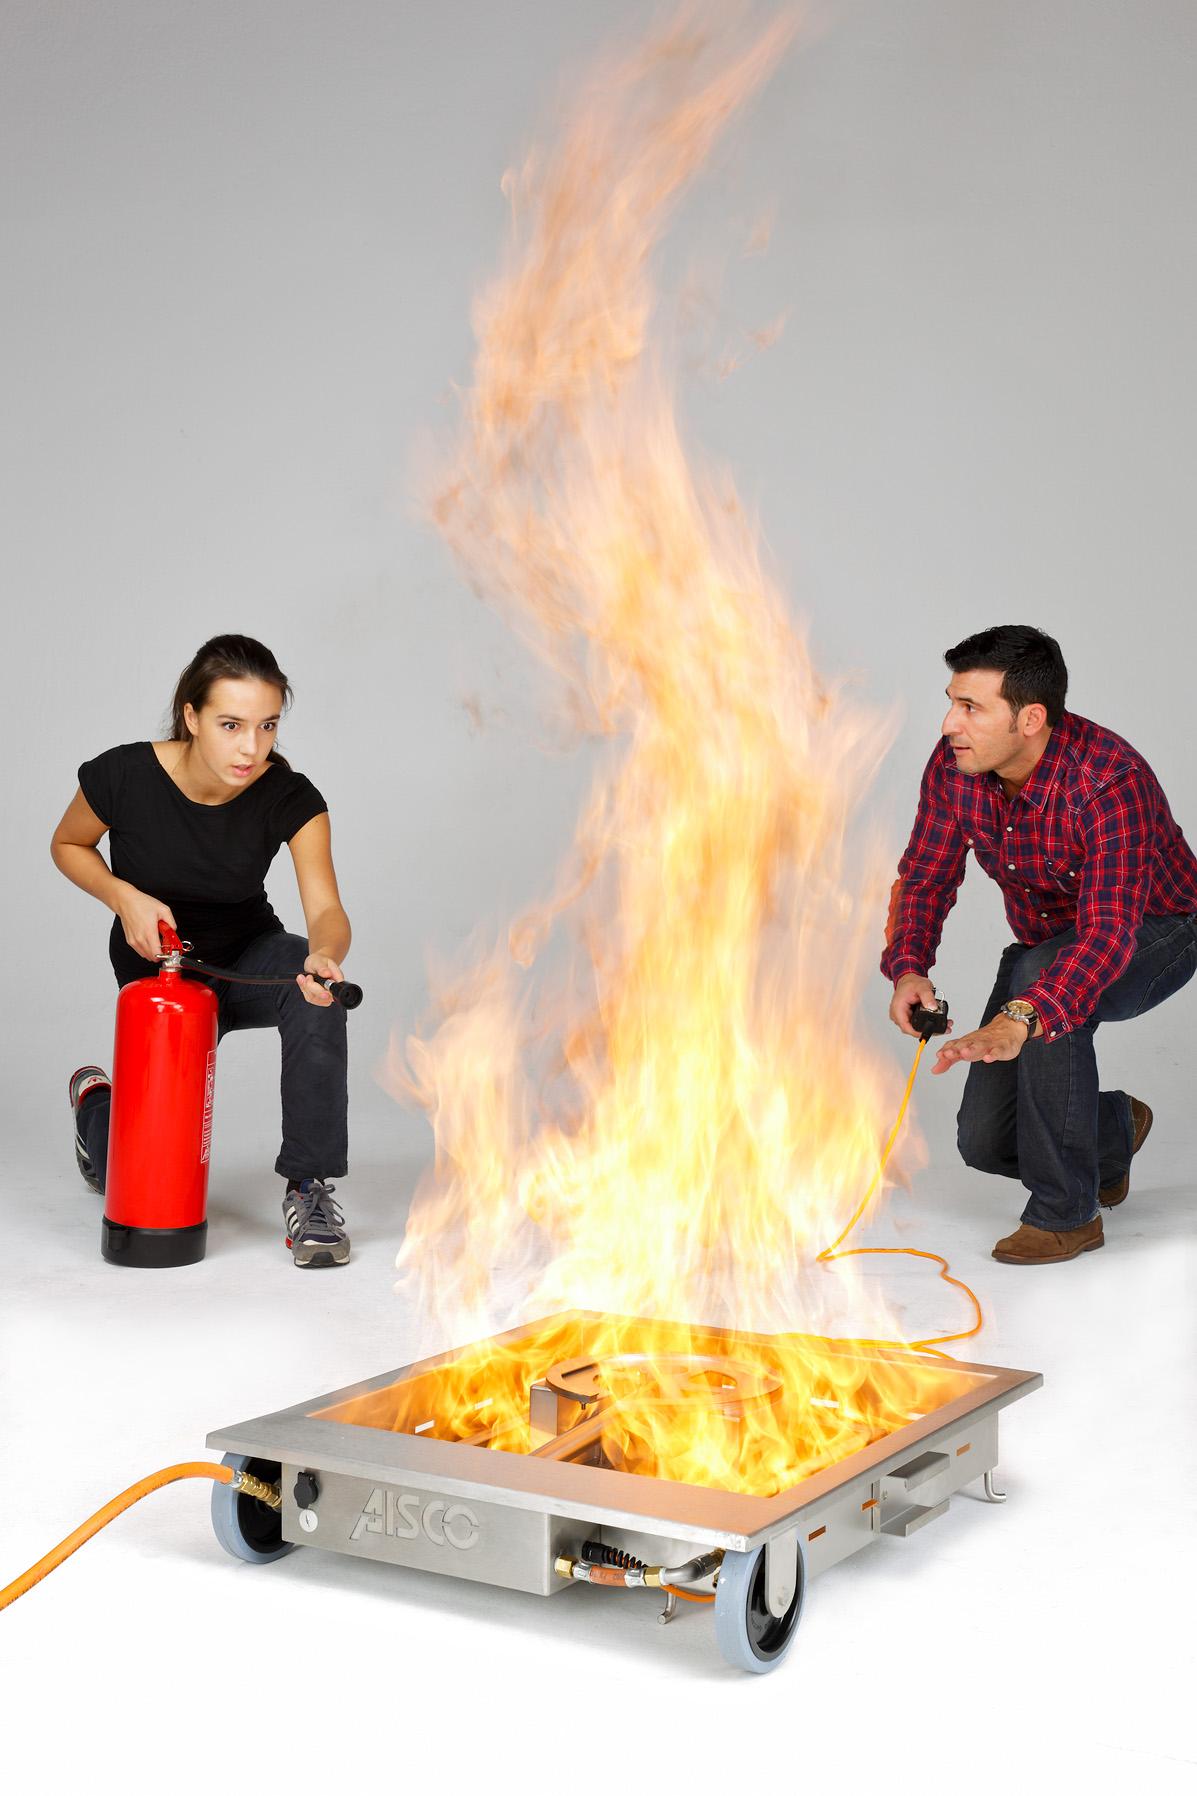 AISCO Firetrainer - Fire Trainer E100 Brandfläche